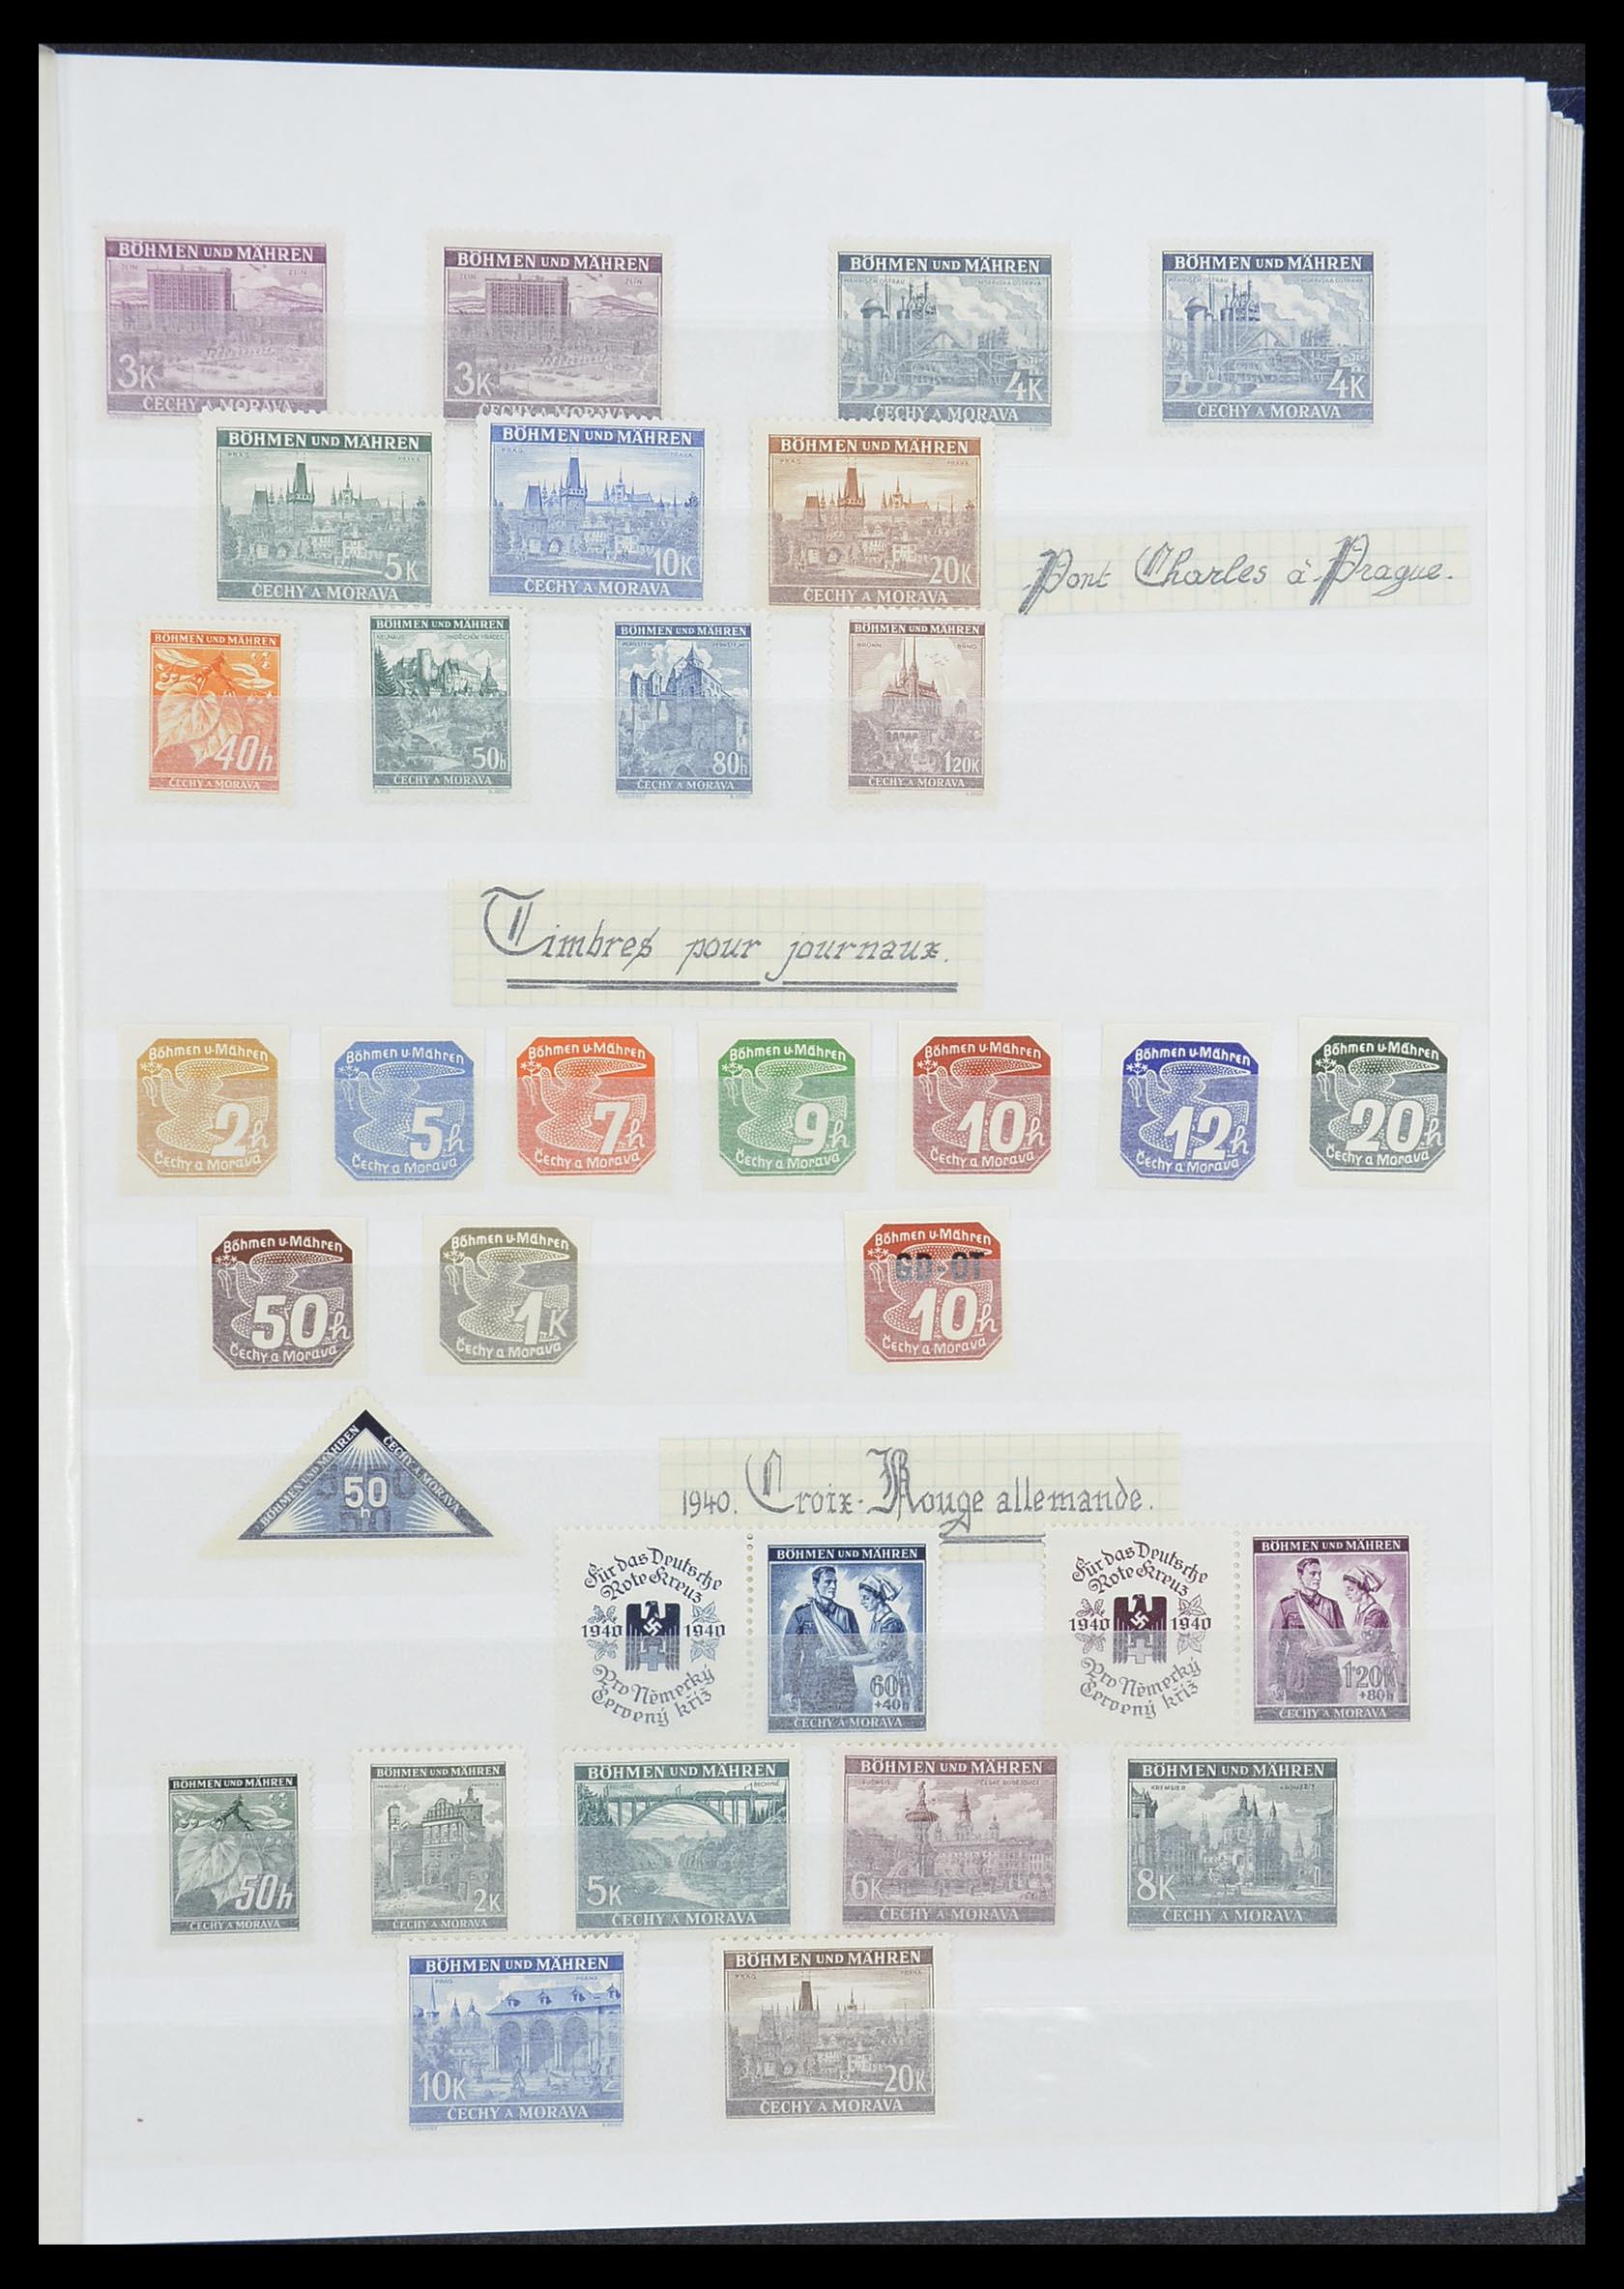 33850 009 - Postzegelverzameling 33850 Duitse bezettingen 2e wereldoorlog 1939-19